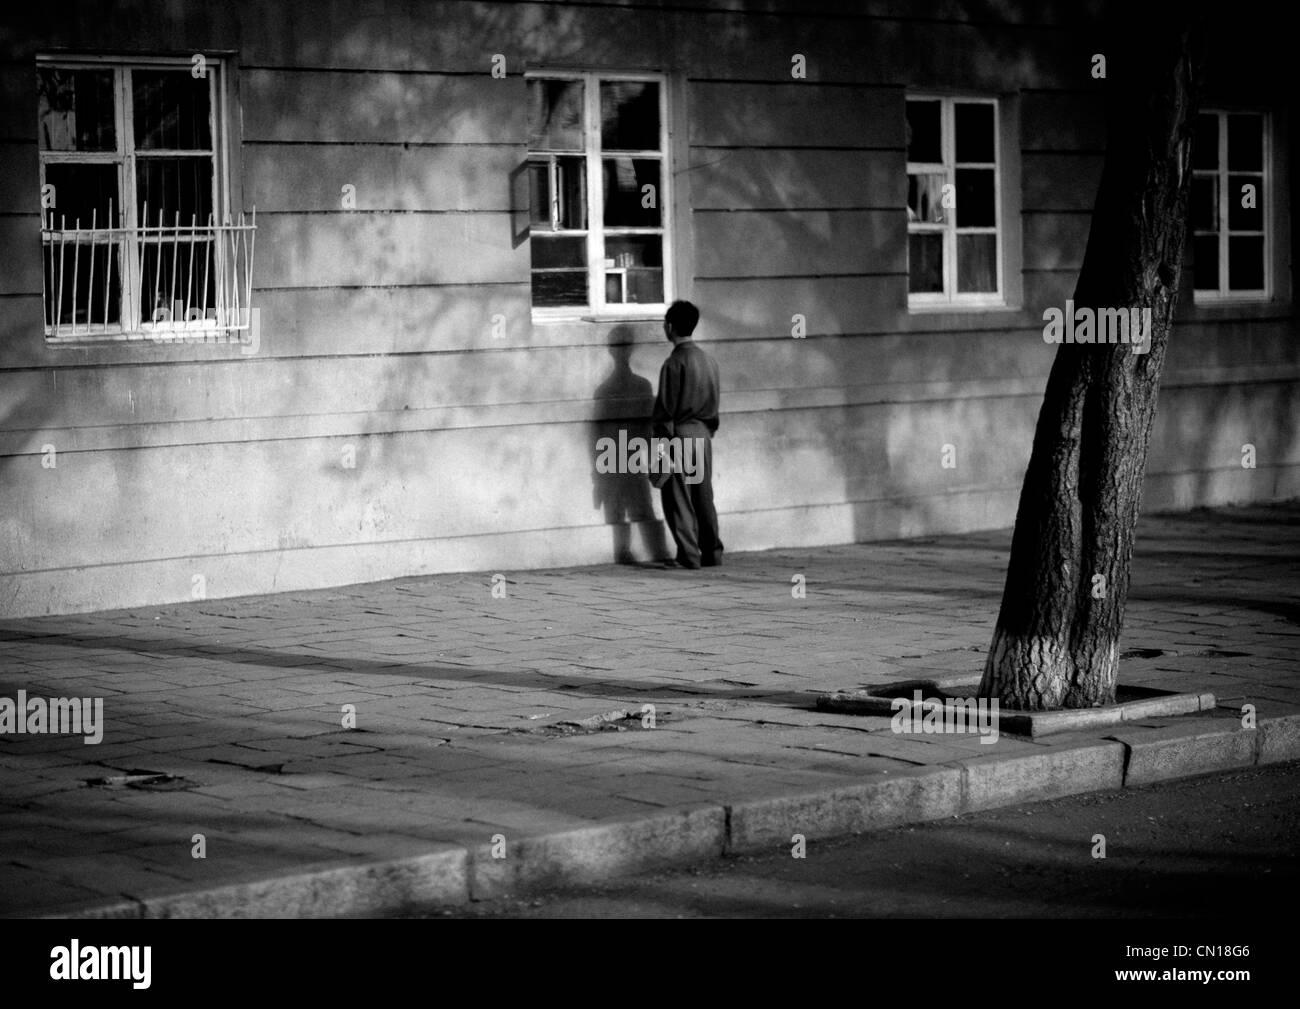 Man in the street in Pyongyang, North Korea - Stock Image